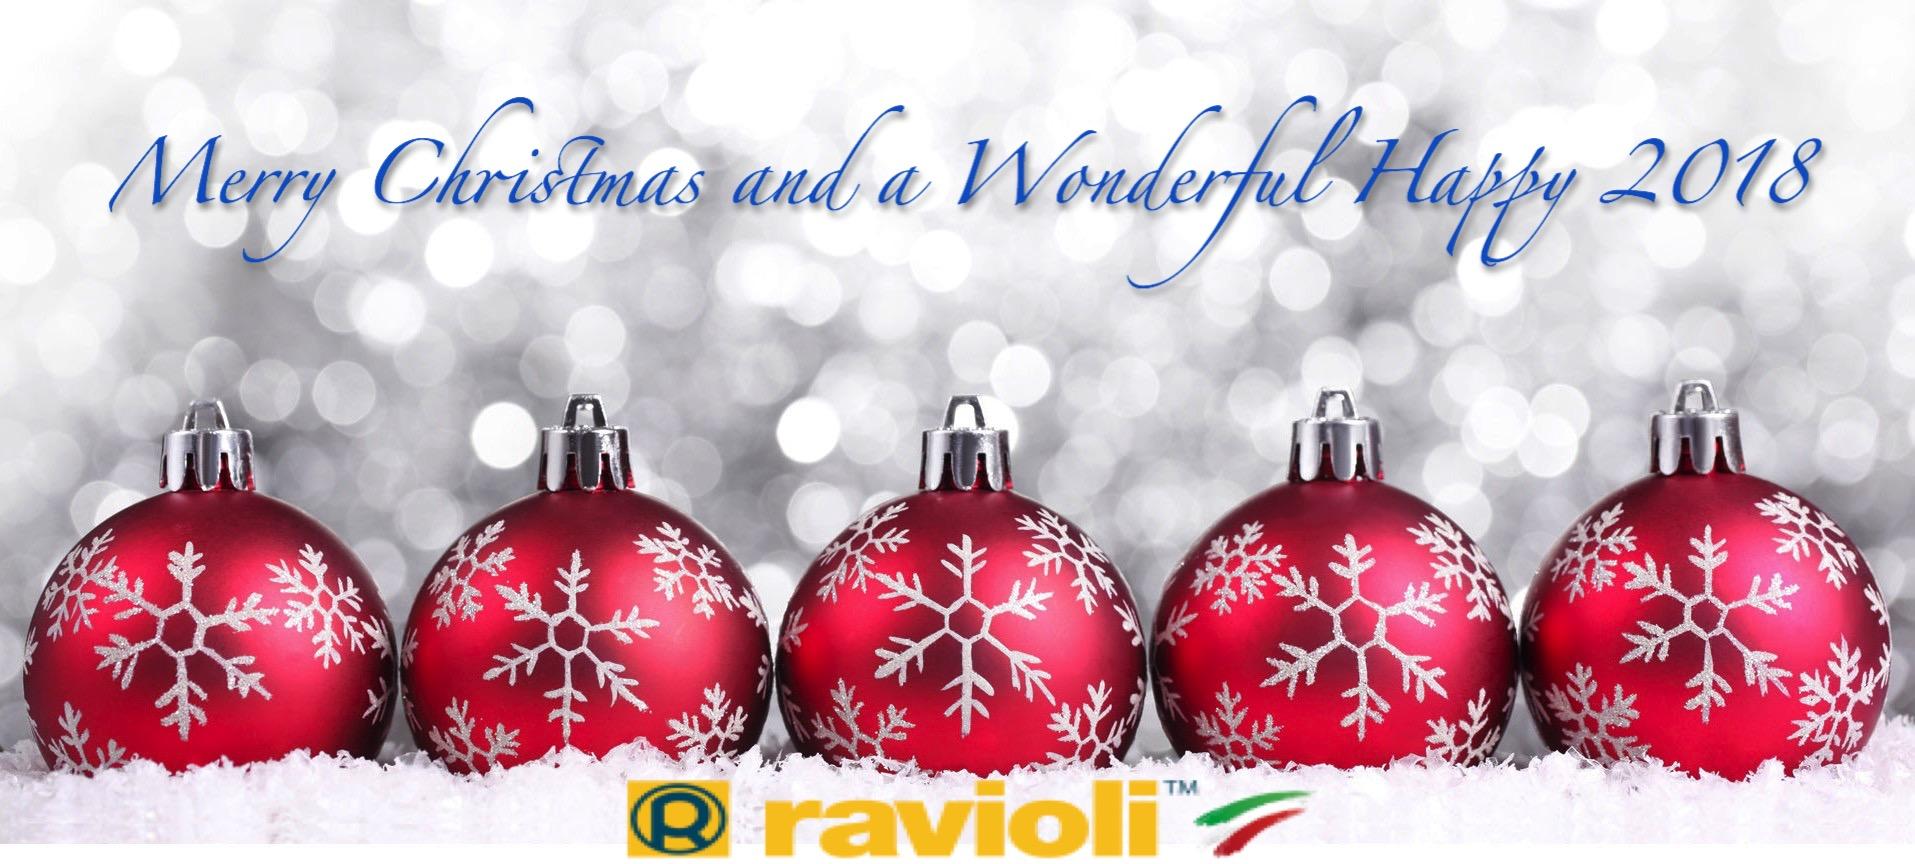 Merry Christmas From Ravioli Spa Ravioli Spa